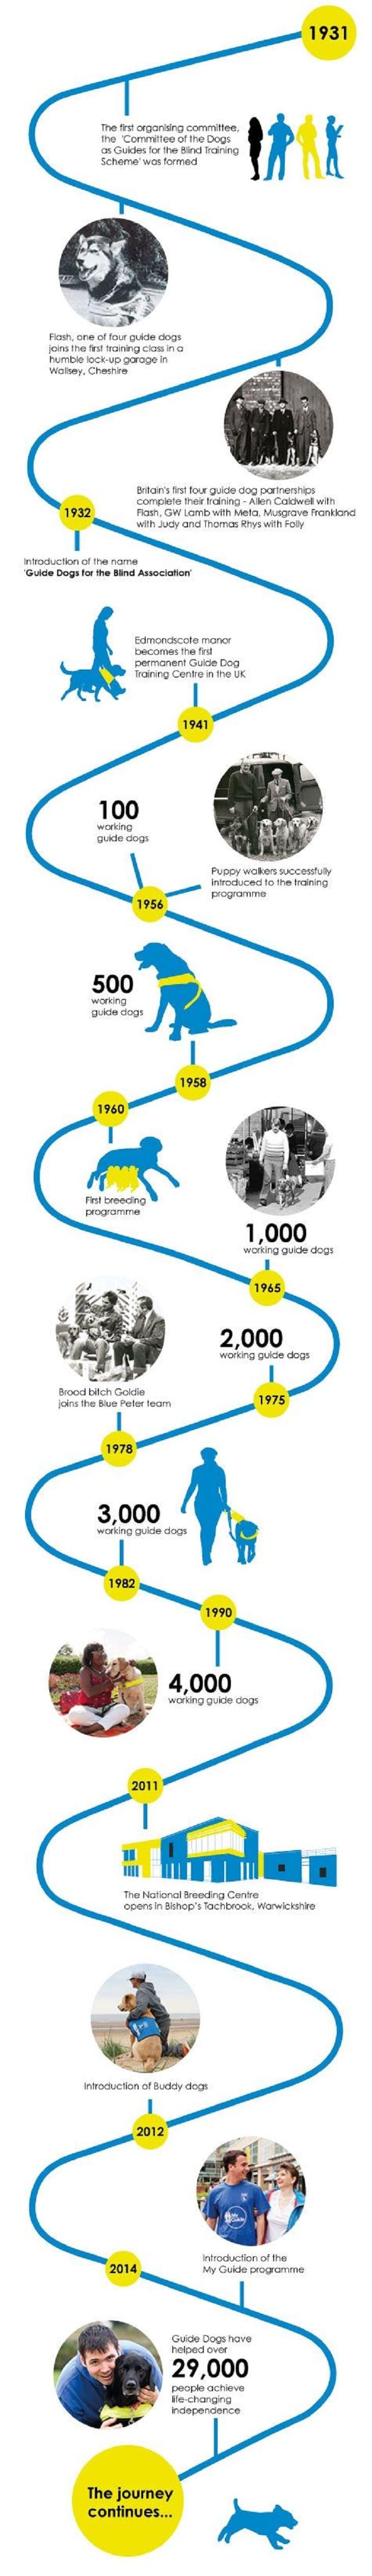 Guide chiens infographique